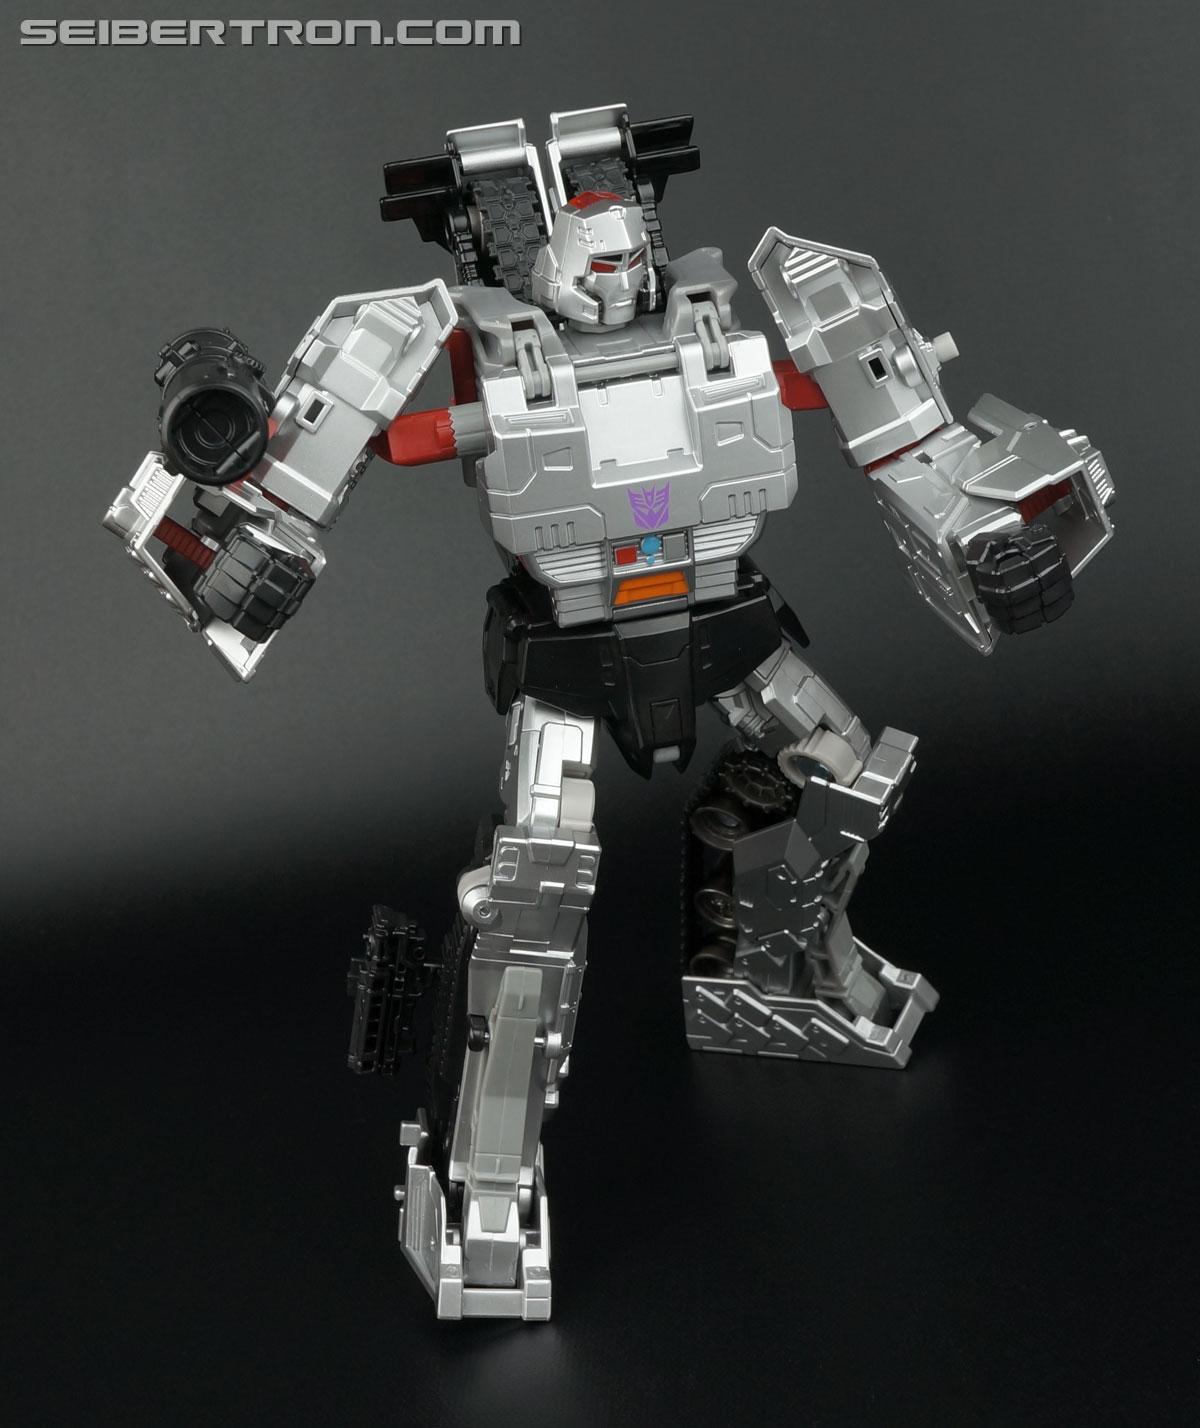 Transformers Legends Megatron (Image #111 of 129)